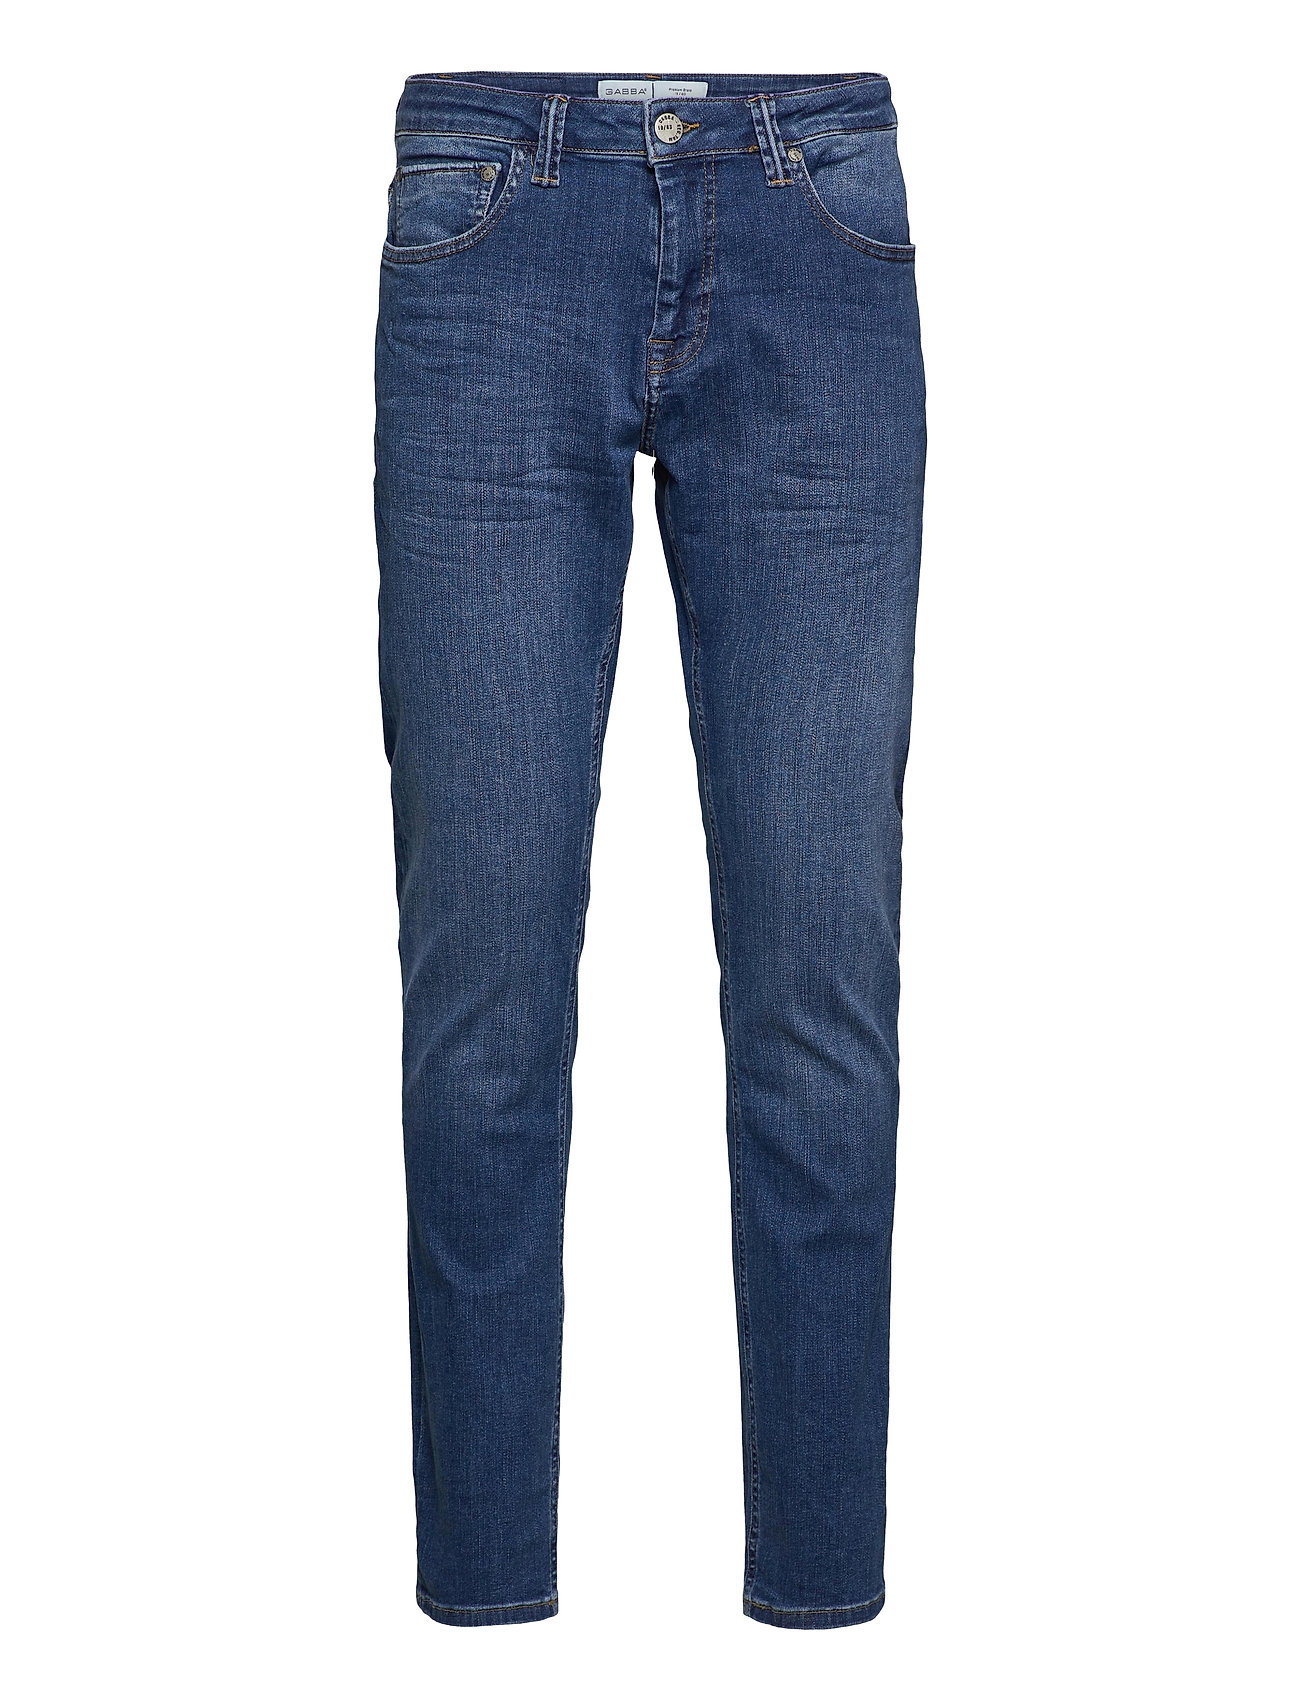 Image of J S K3870 Jeans Slim Jeans Blå Gabba (3493873959)